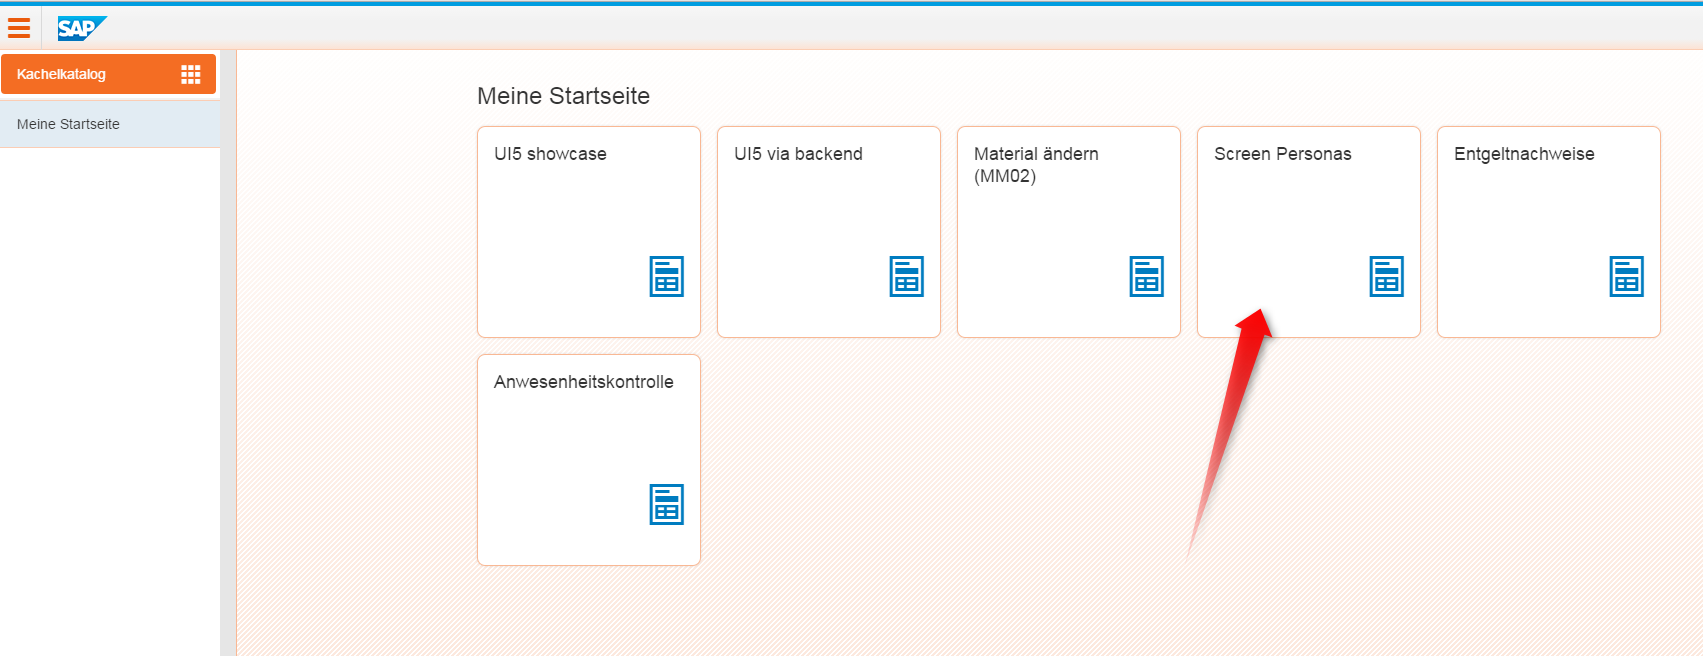 Fiori Framework Page mit SAP Screen Personas